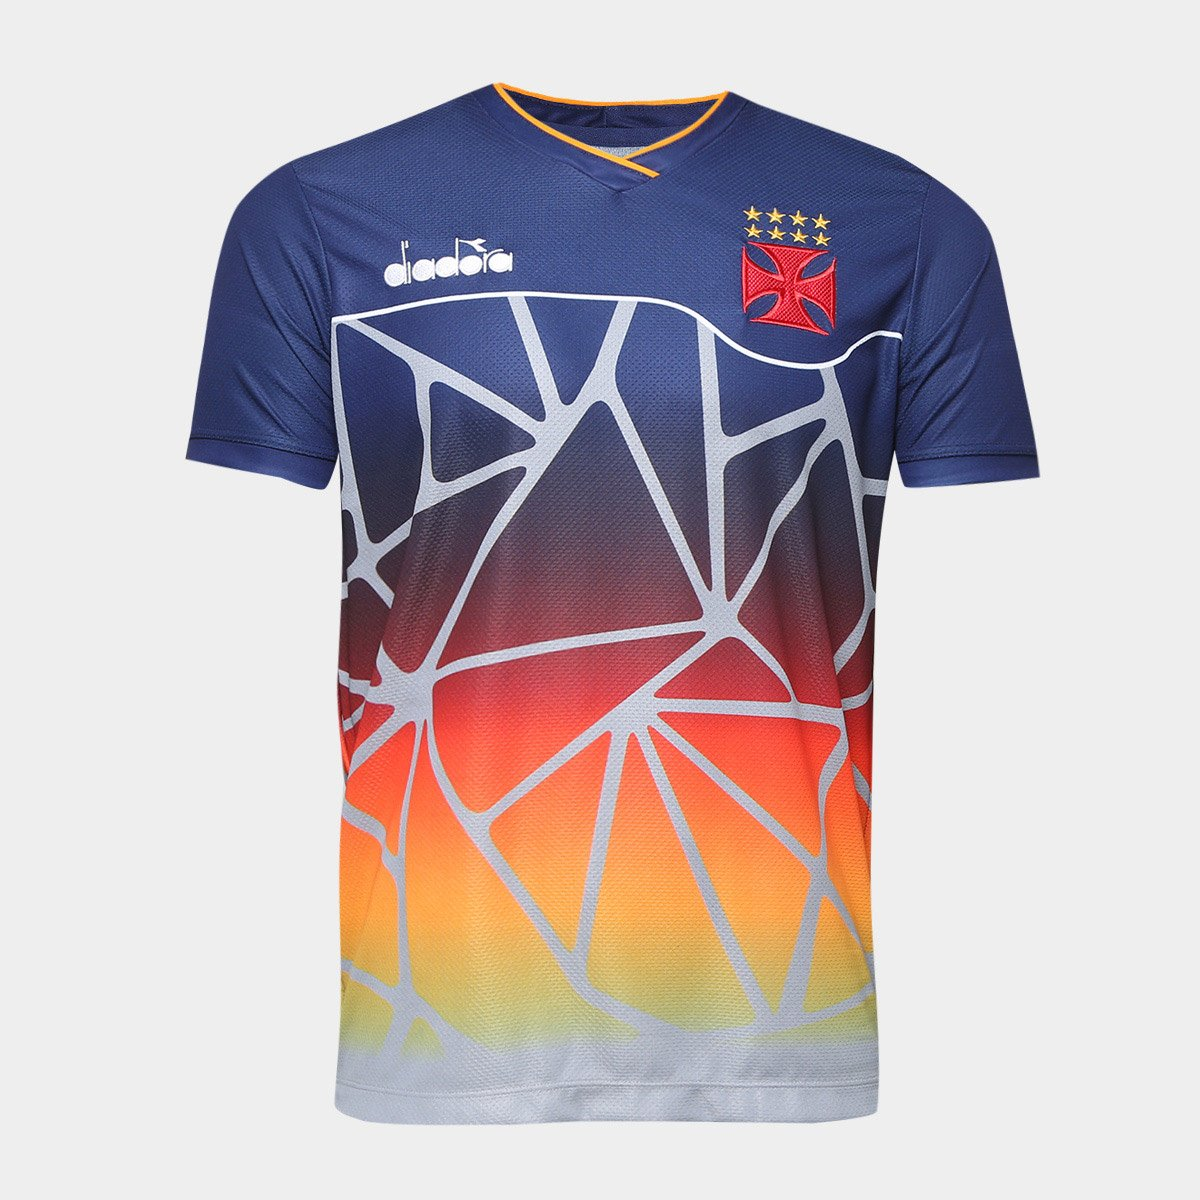 Camisa Vasco Treino 2018 Atleta Diadora Masculina - Compre Agora ... 26bffbb66dafd